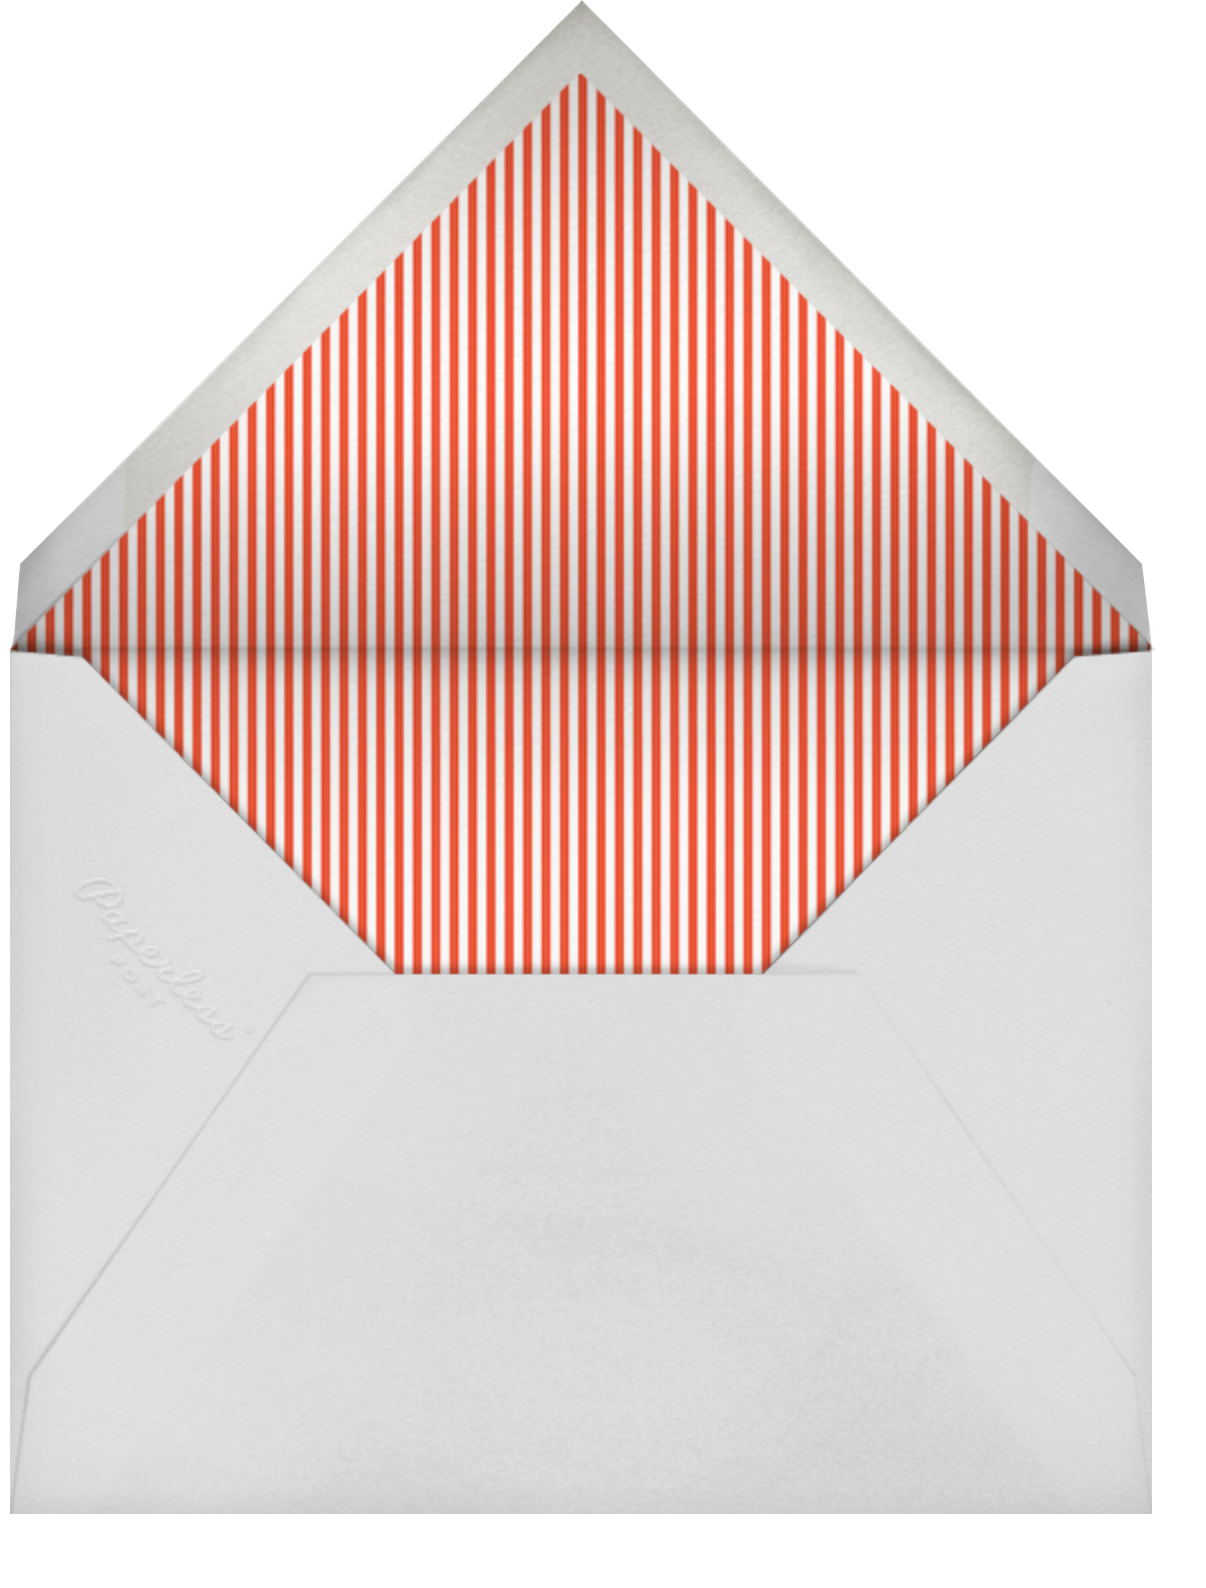 Light It Up - Greeting - Mr. Boddington's Studio - Envelope